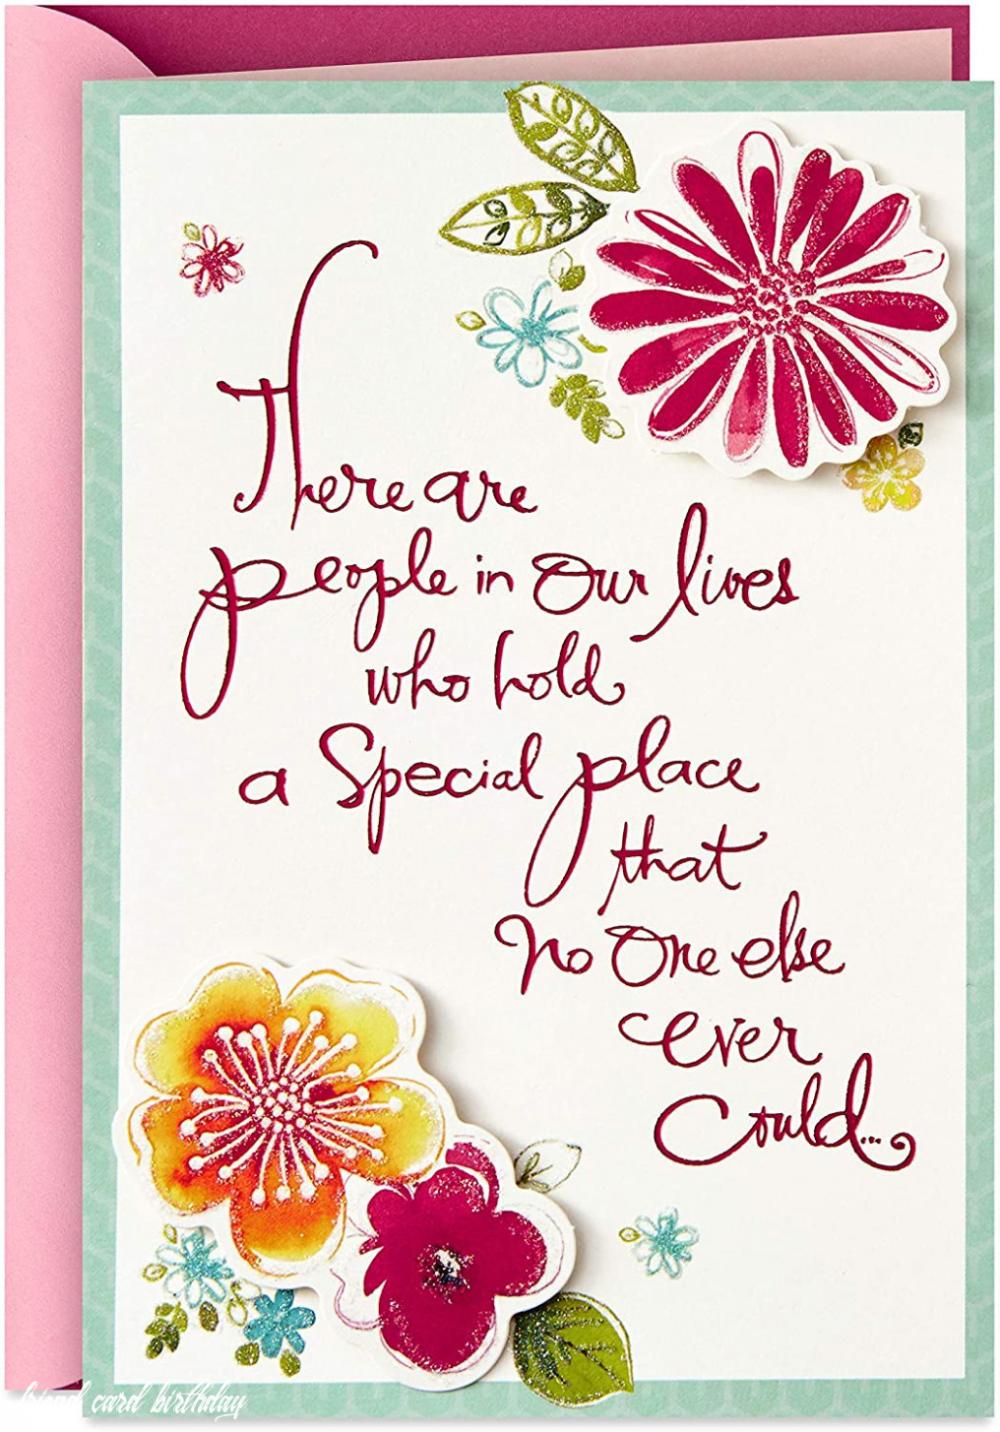 Hallmark Birthday Card For Friend People Like You In 2020 Hallmark Birthday Card Birthday Cards For Friends Birthday Cards To Print